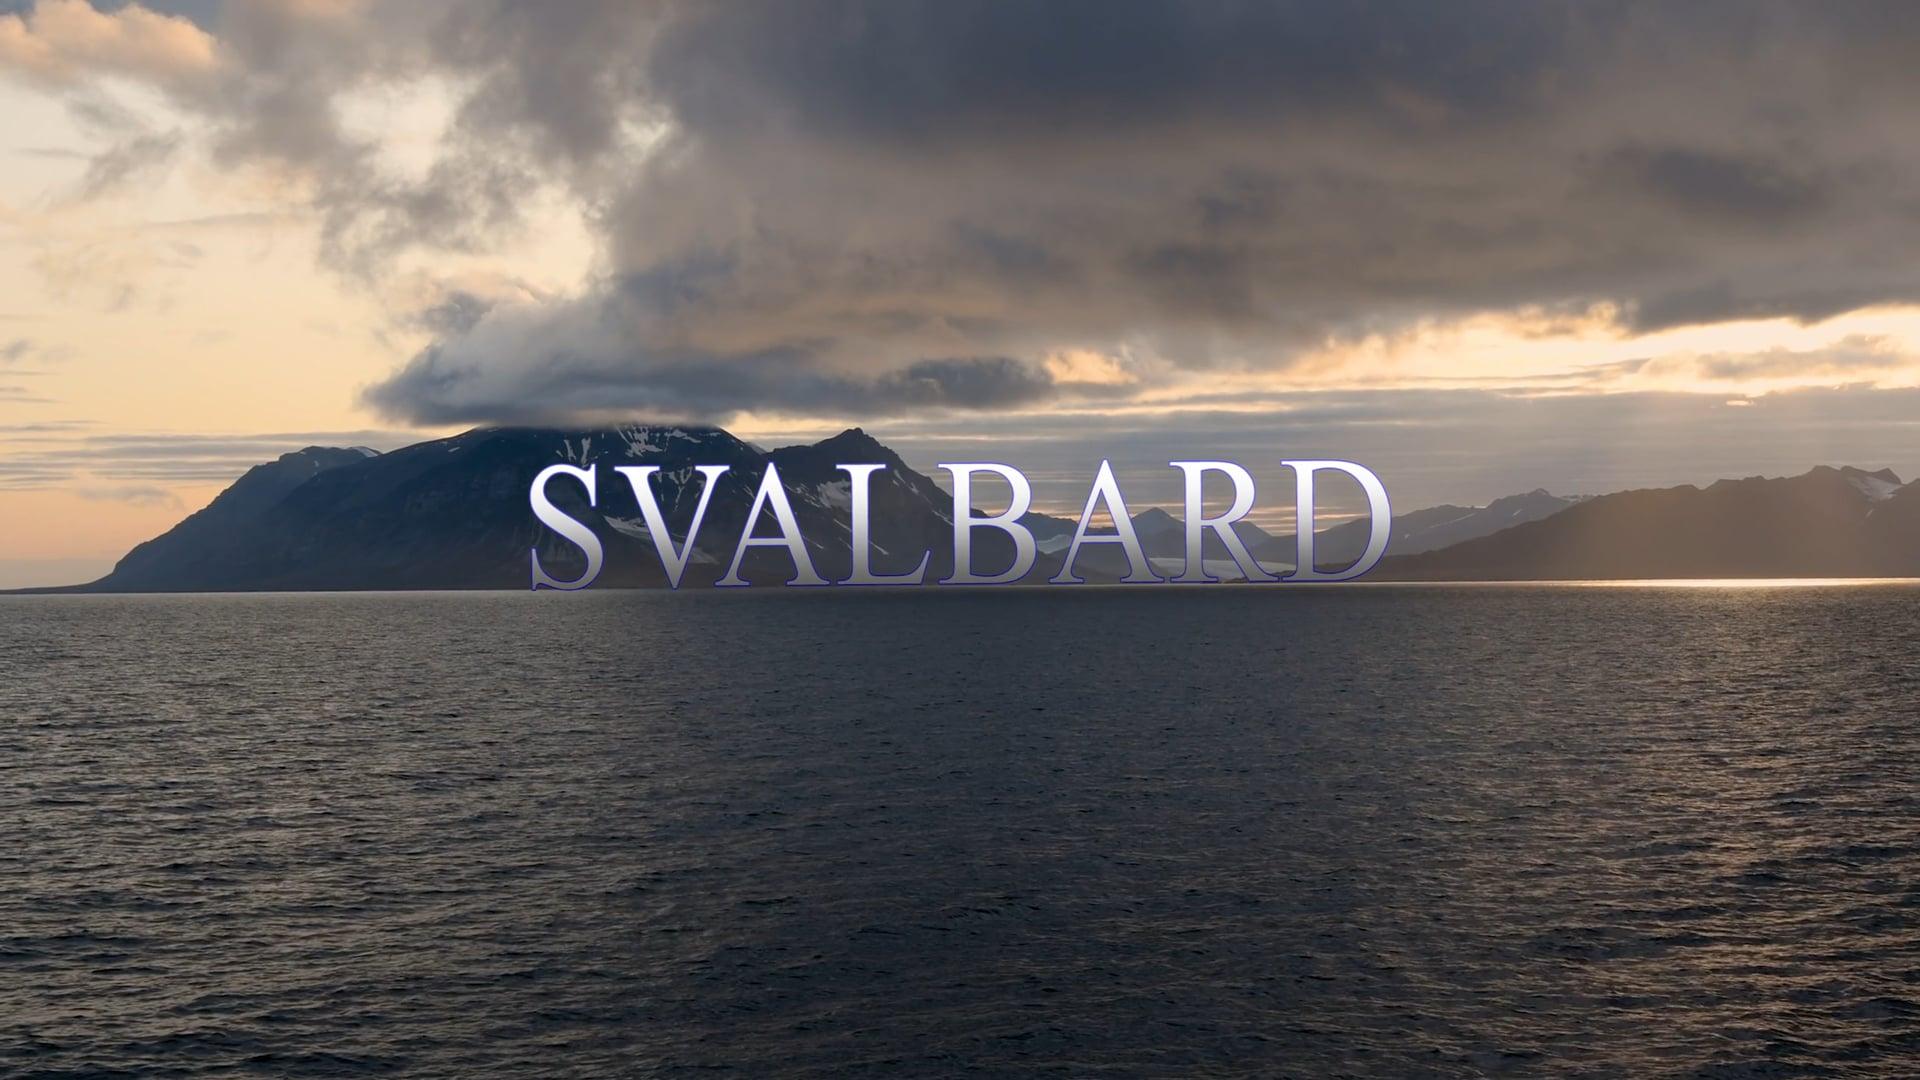 Svalbard! - 4k